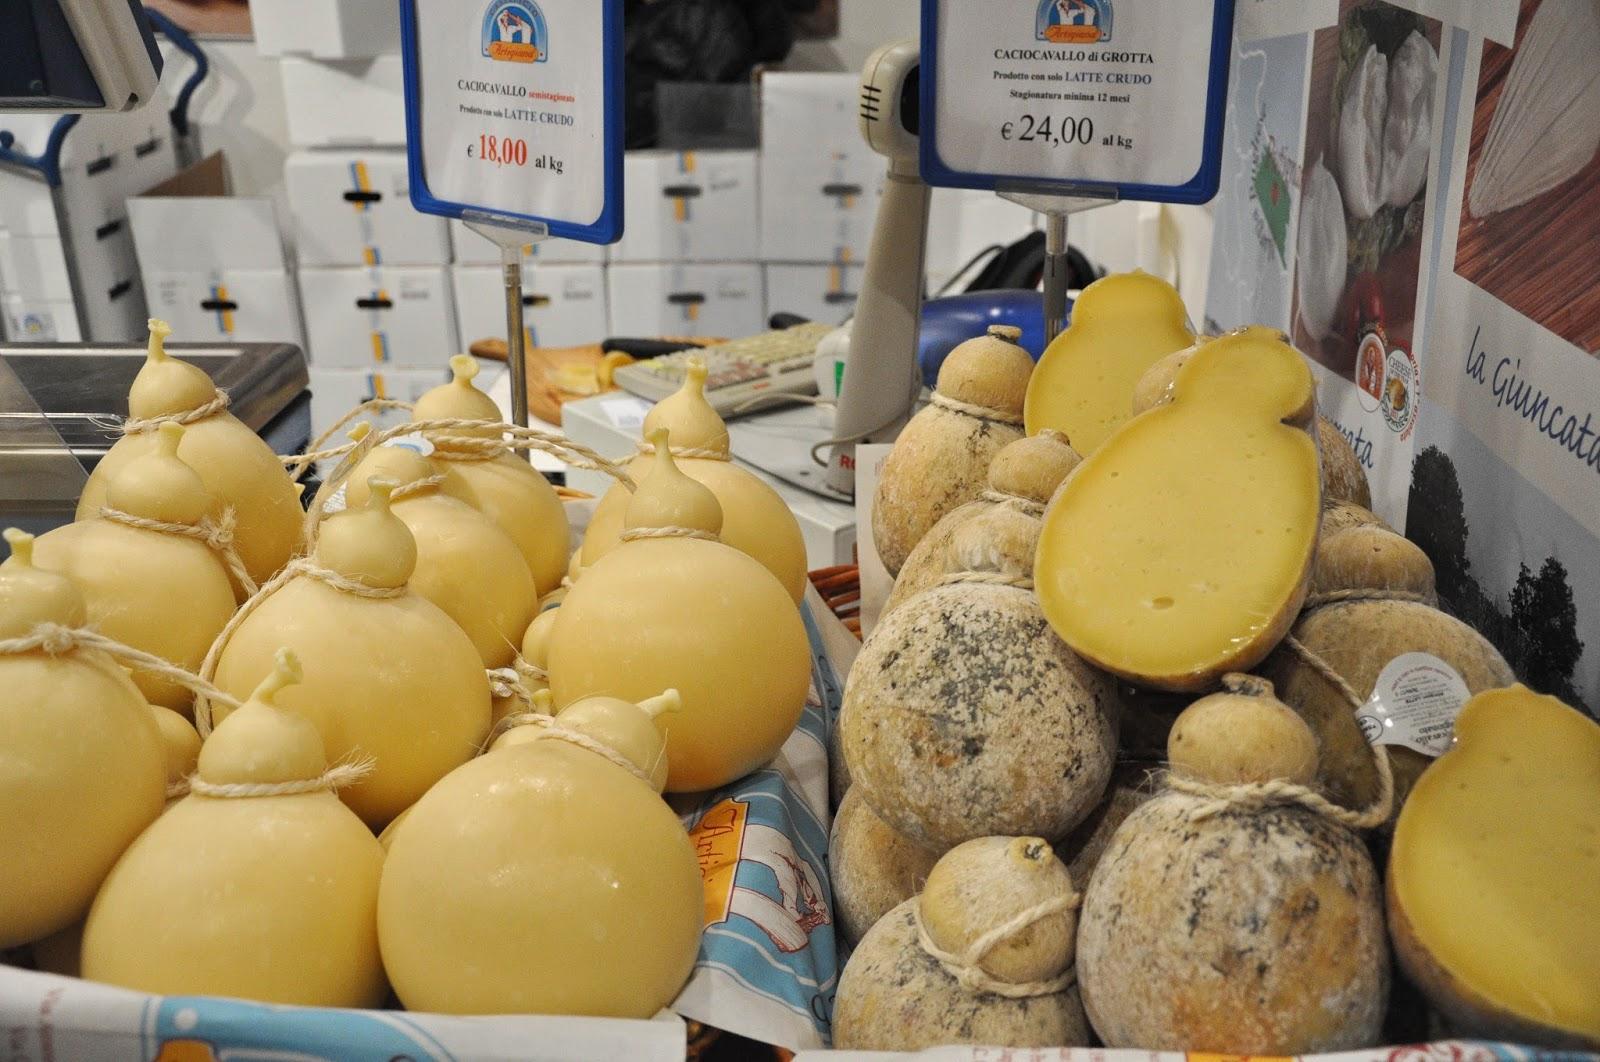 Caciocavallo cheese at CosmoFood Fair, Vicenza, Italy